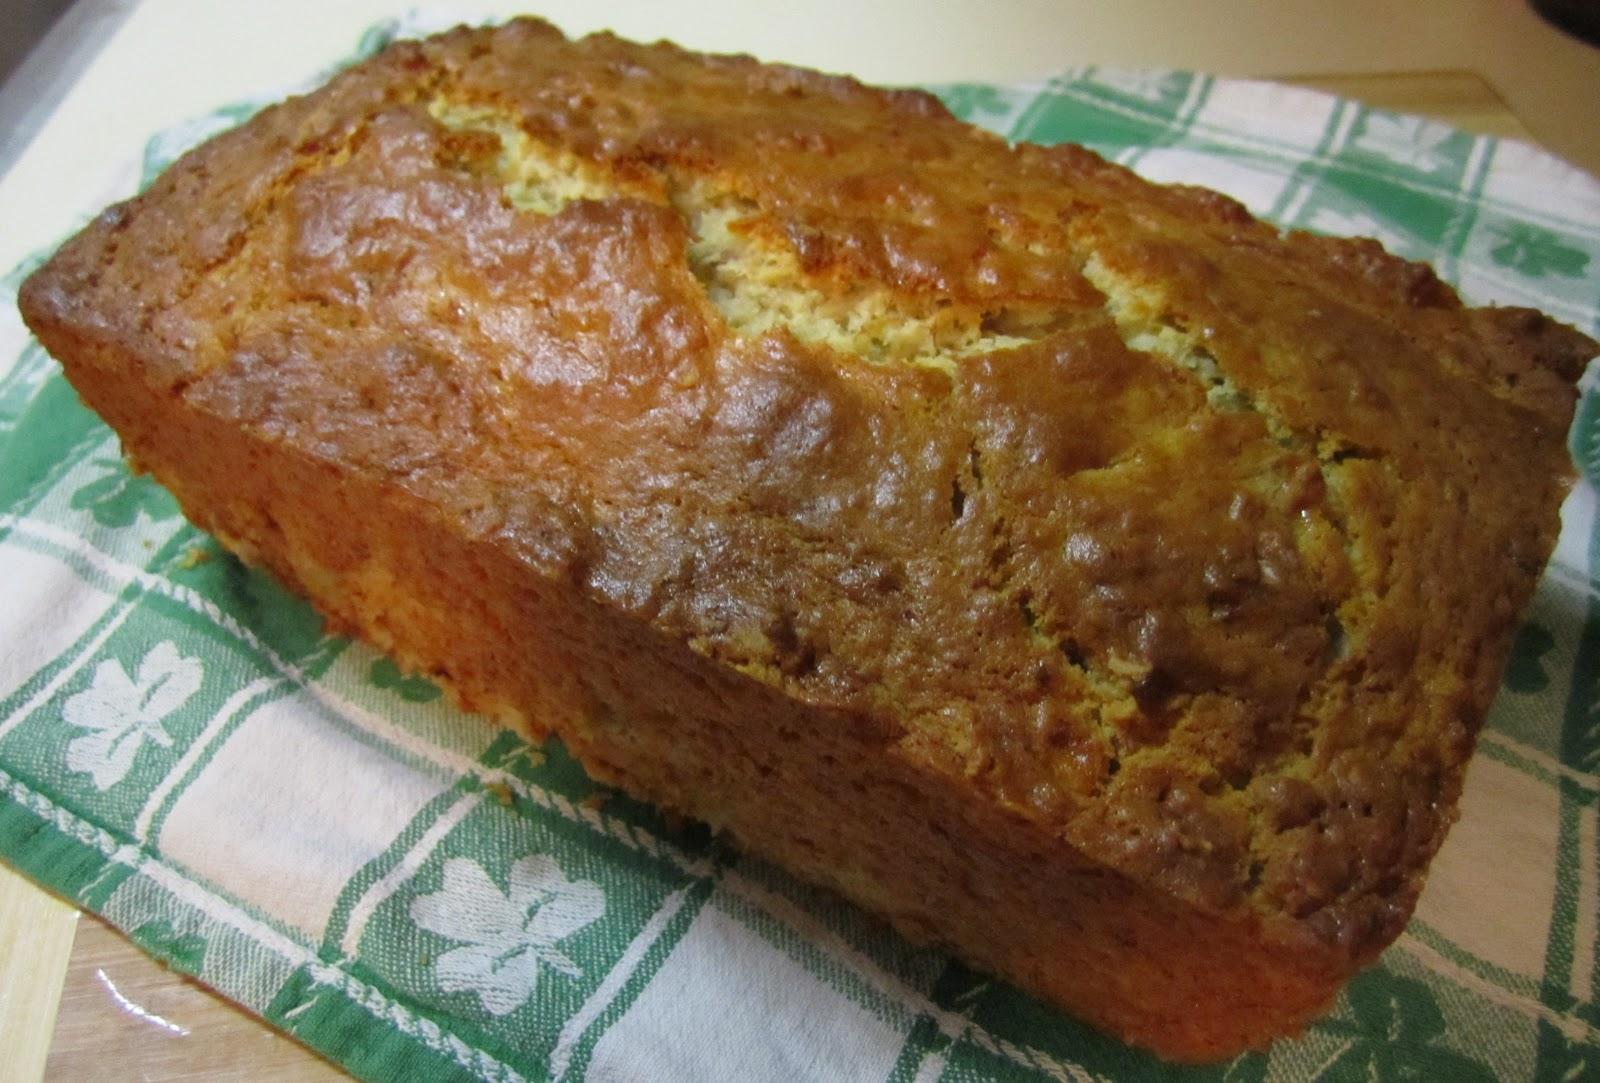 The Irish Mother: Sour Cream Banana Bread